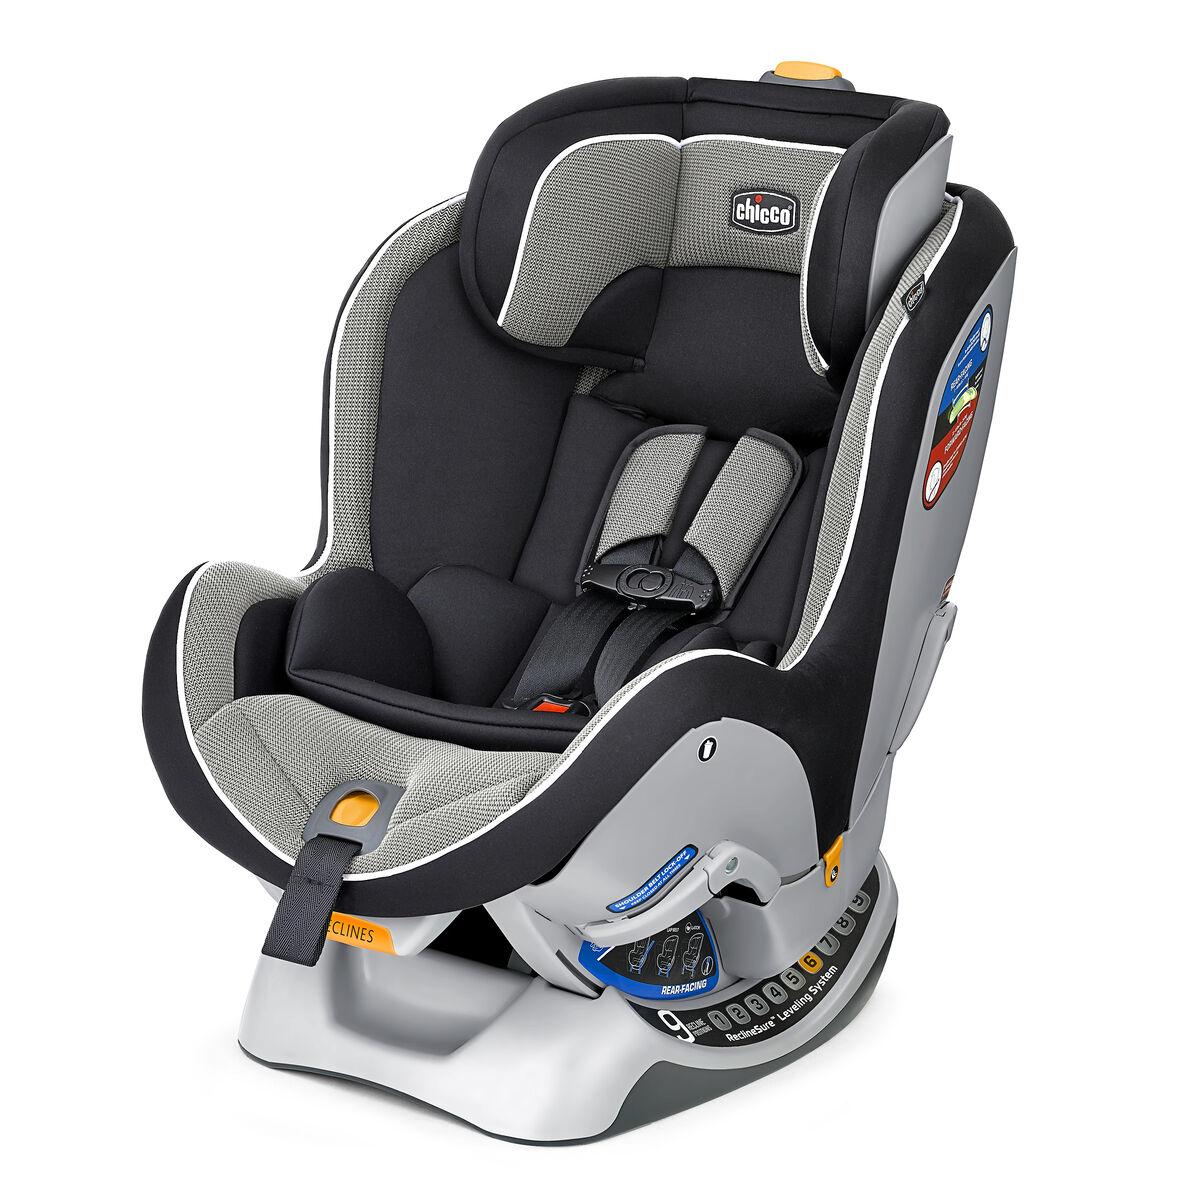 Nextfit convertible car seat intriguenestfit convertible car seat intrigue